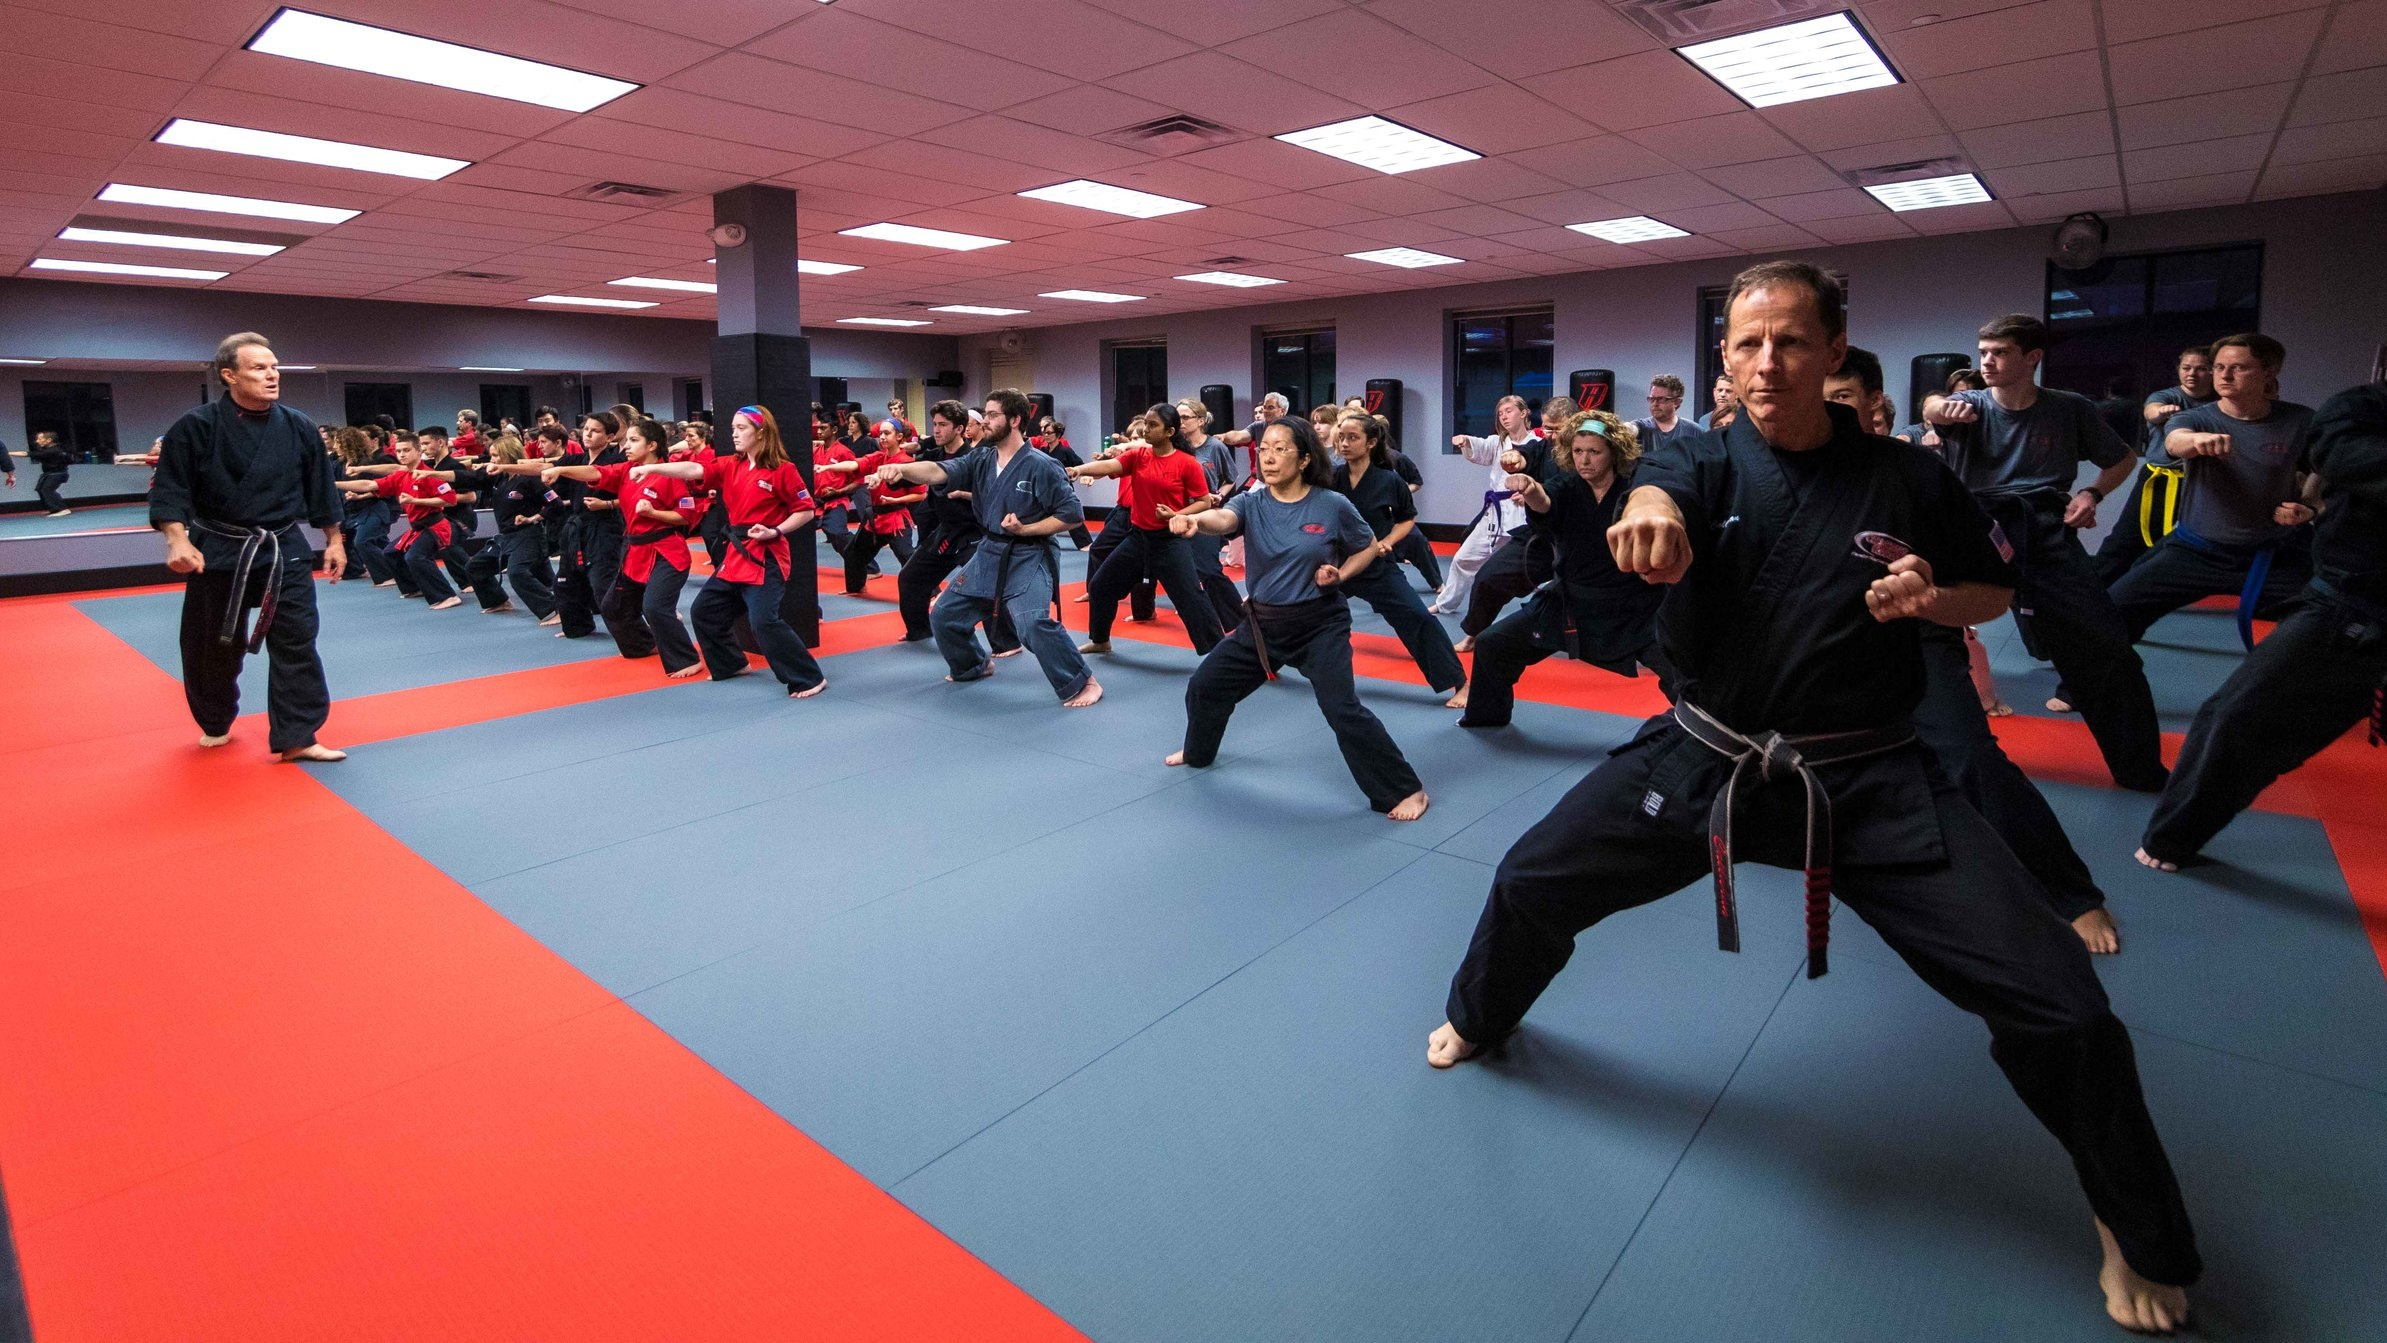 Adult Martial Arts Program Bedford MA 01730 Callahans Karate.jpg